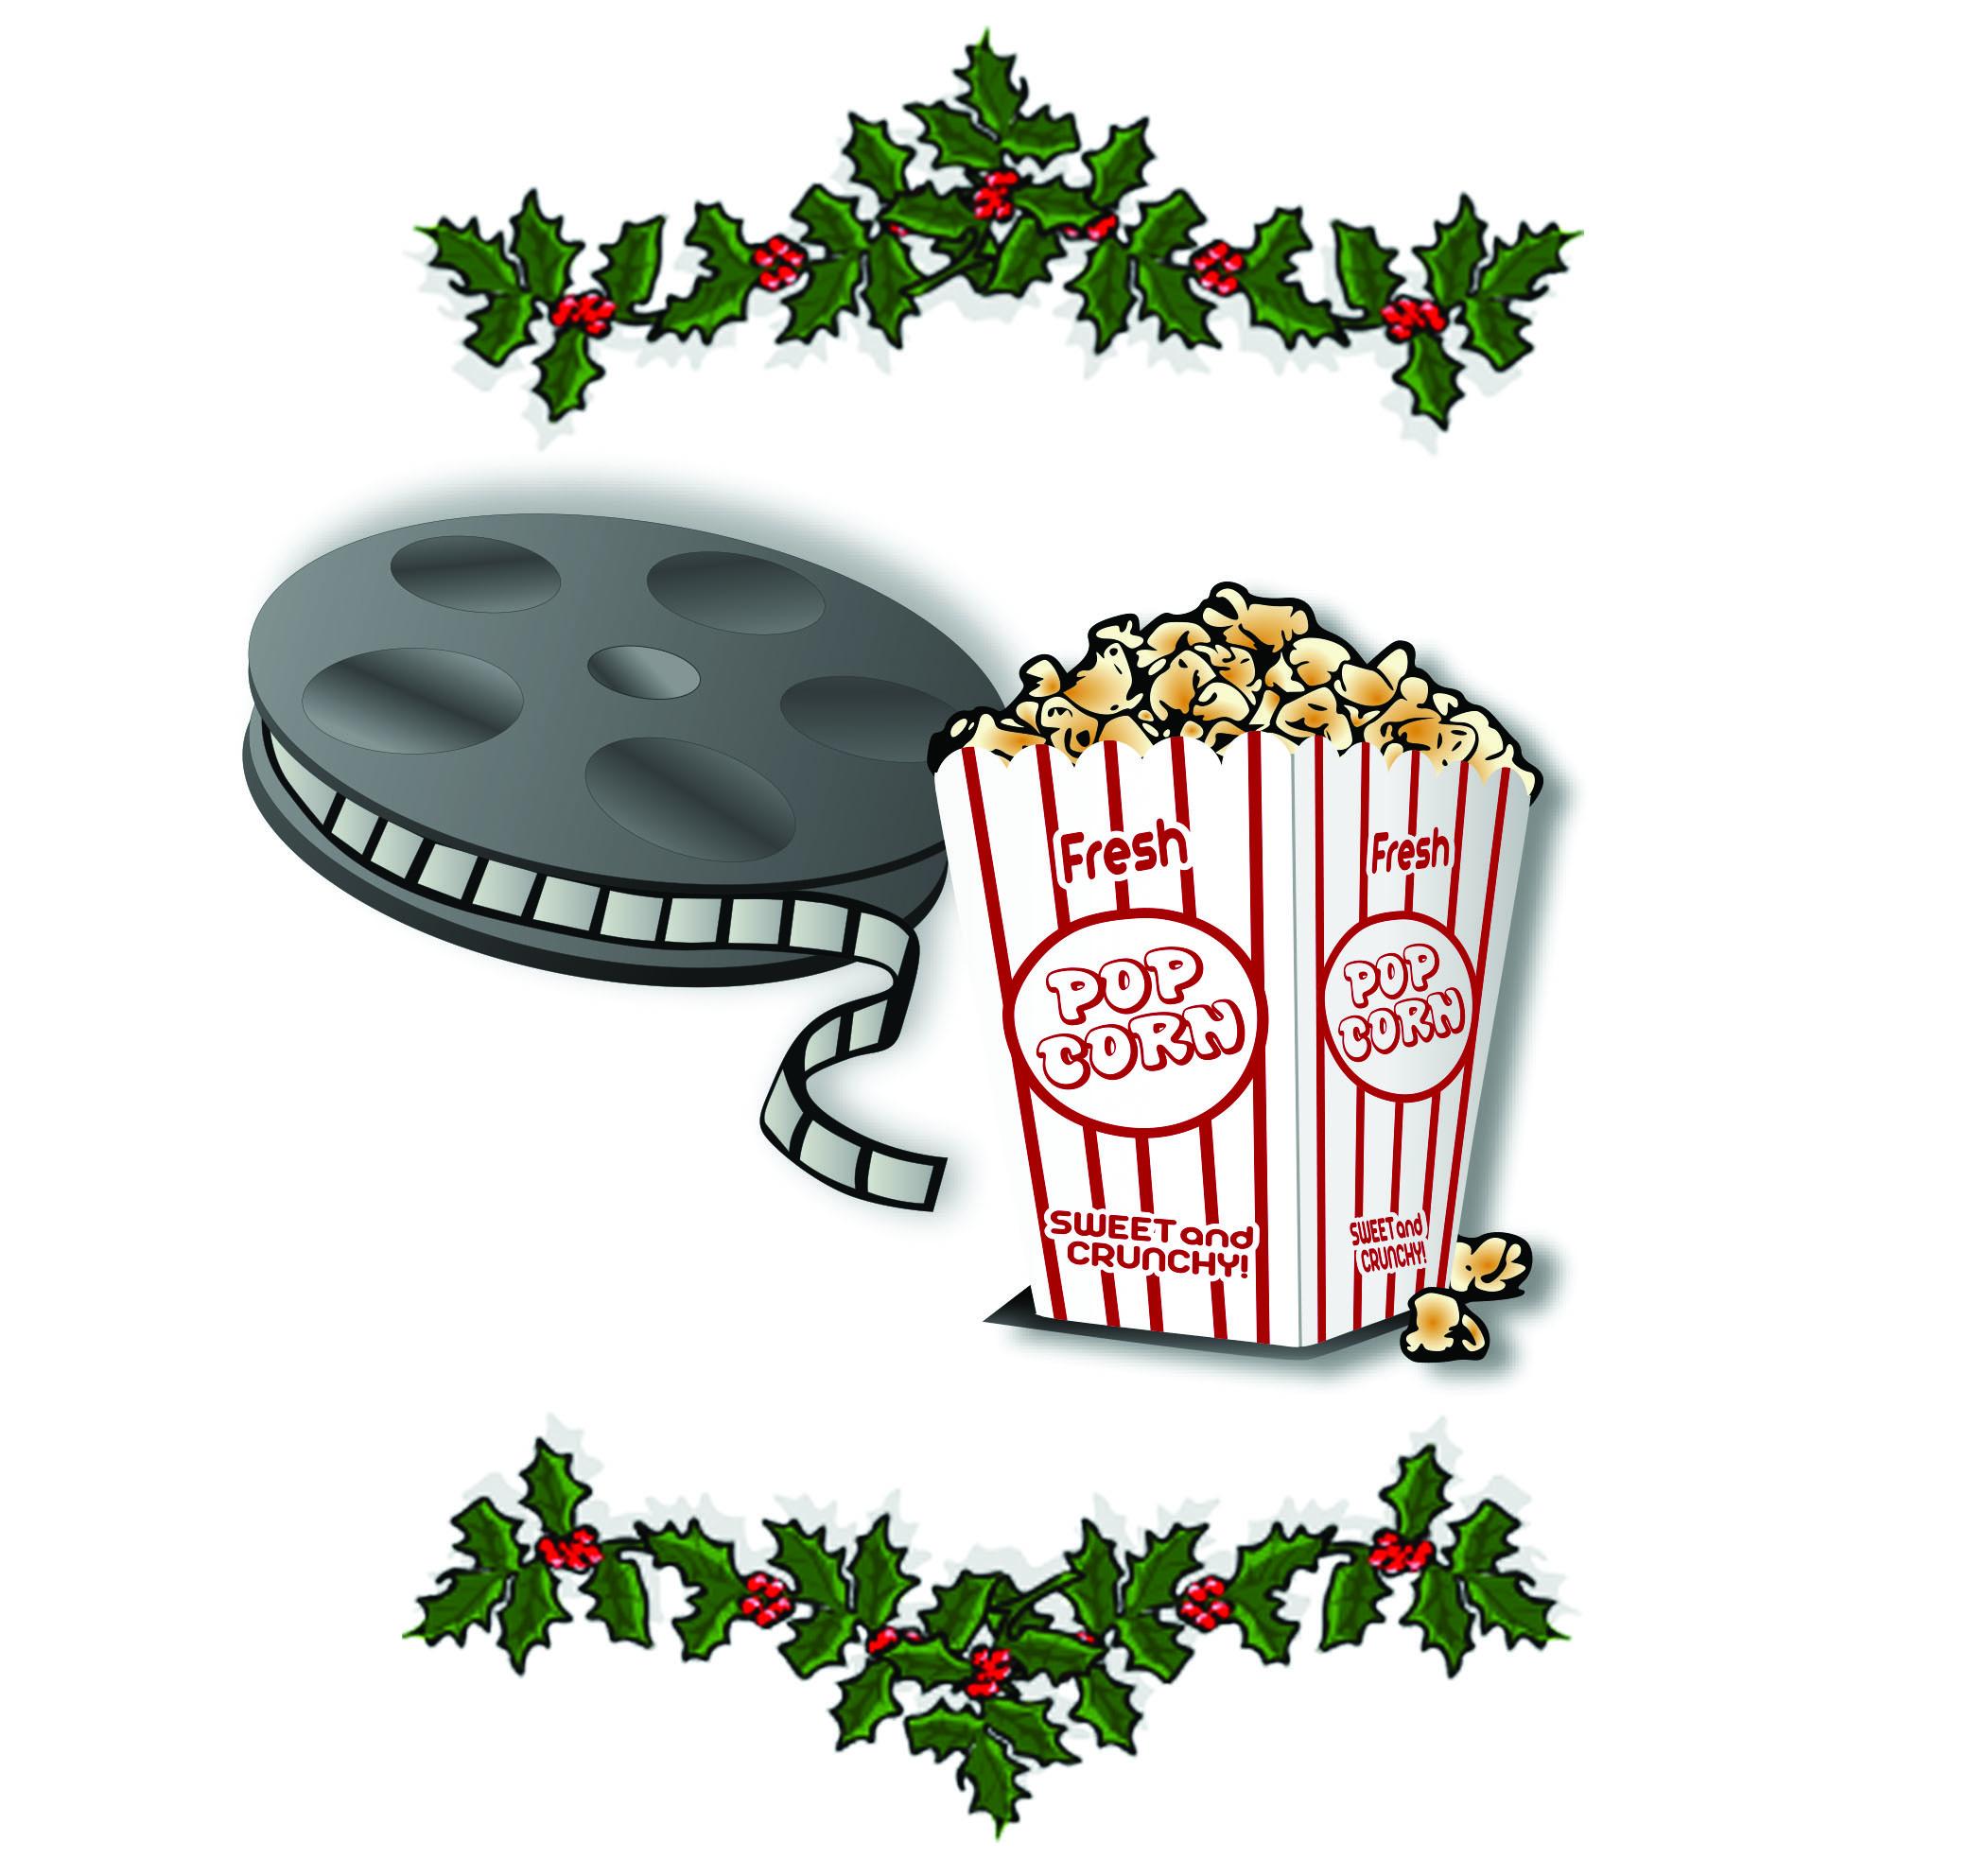 Top 10 Christmas Movies To Watch This Season